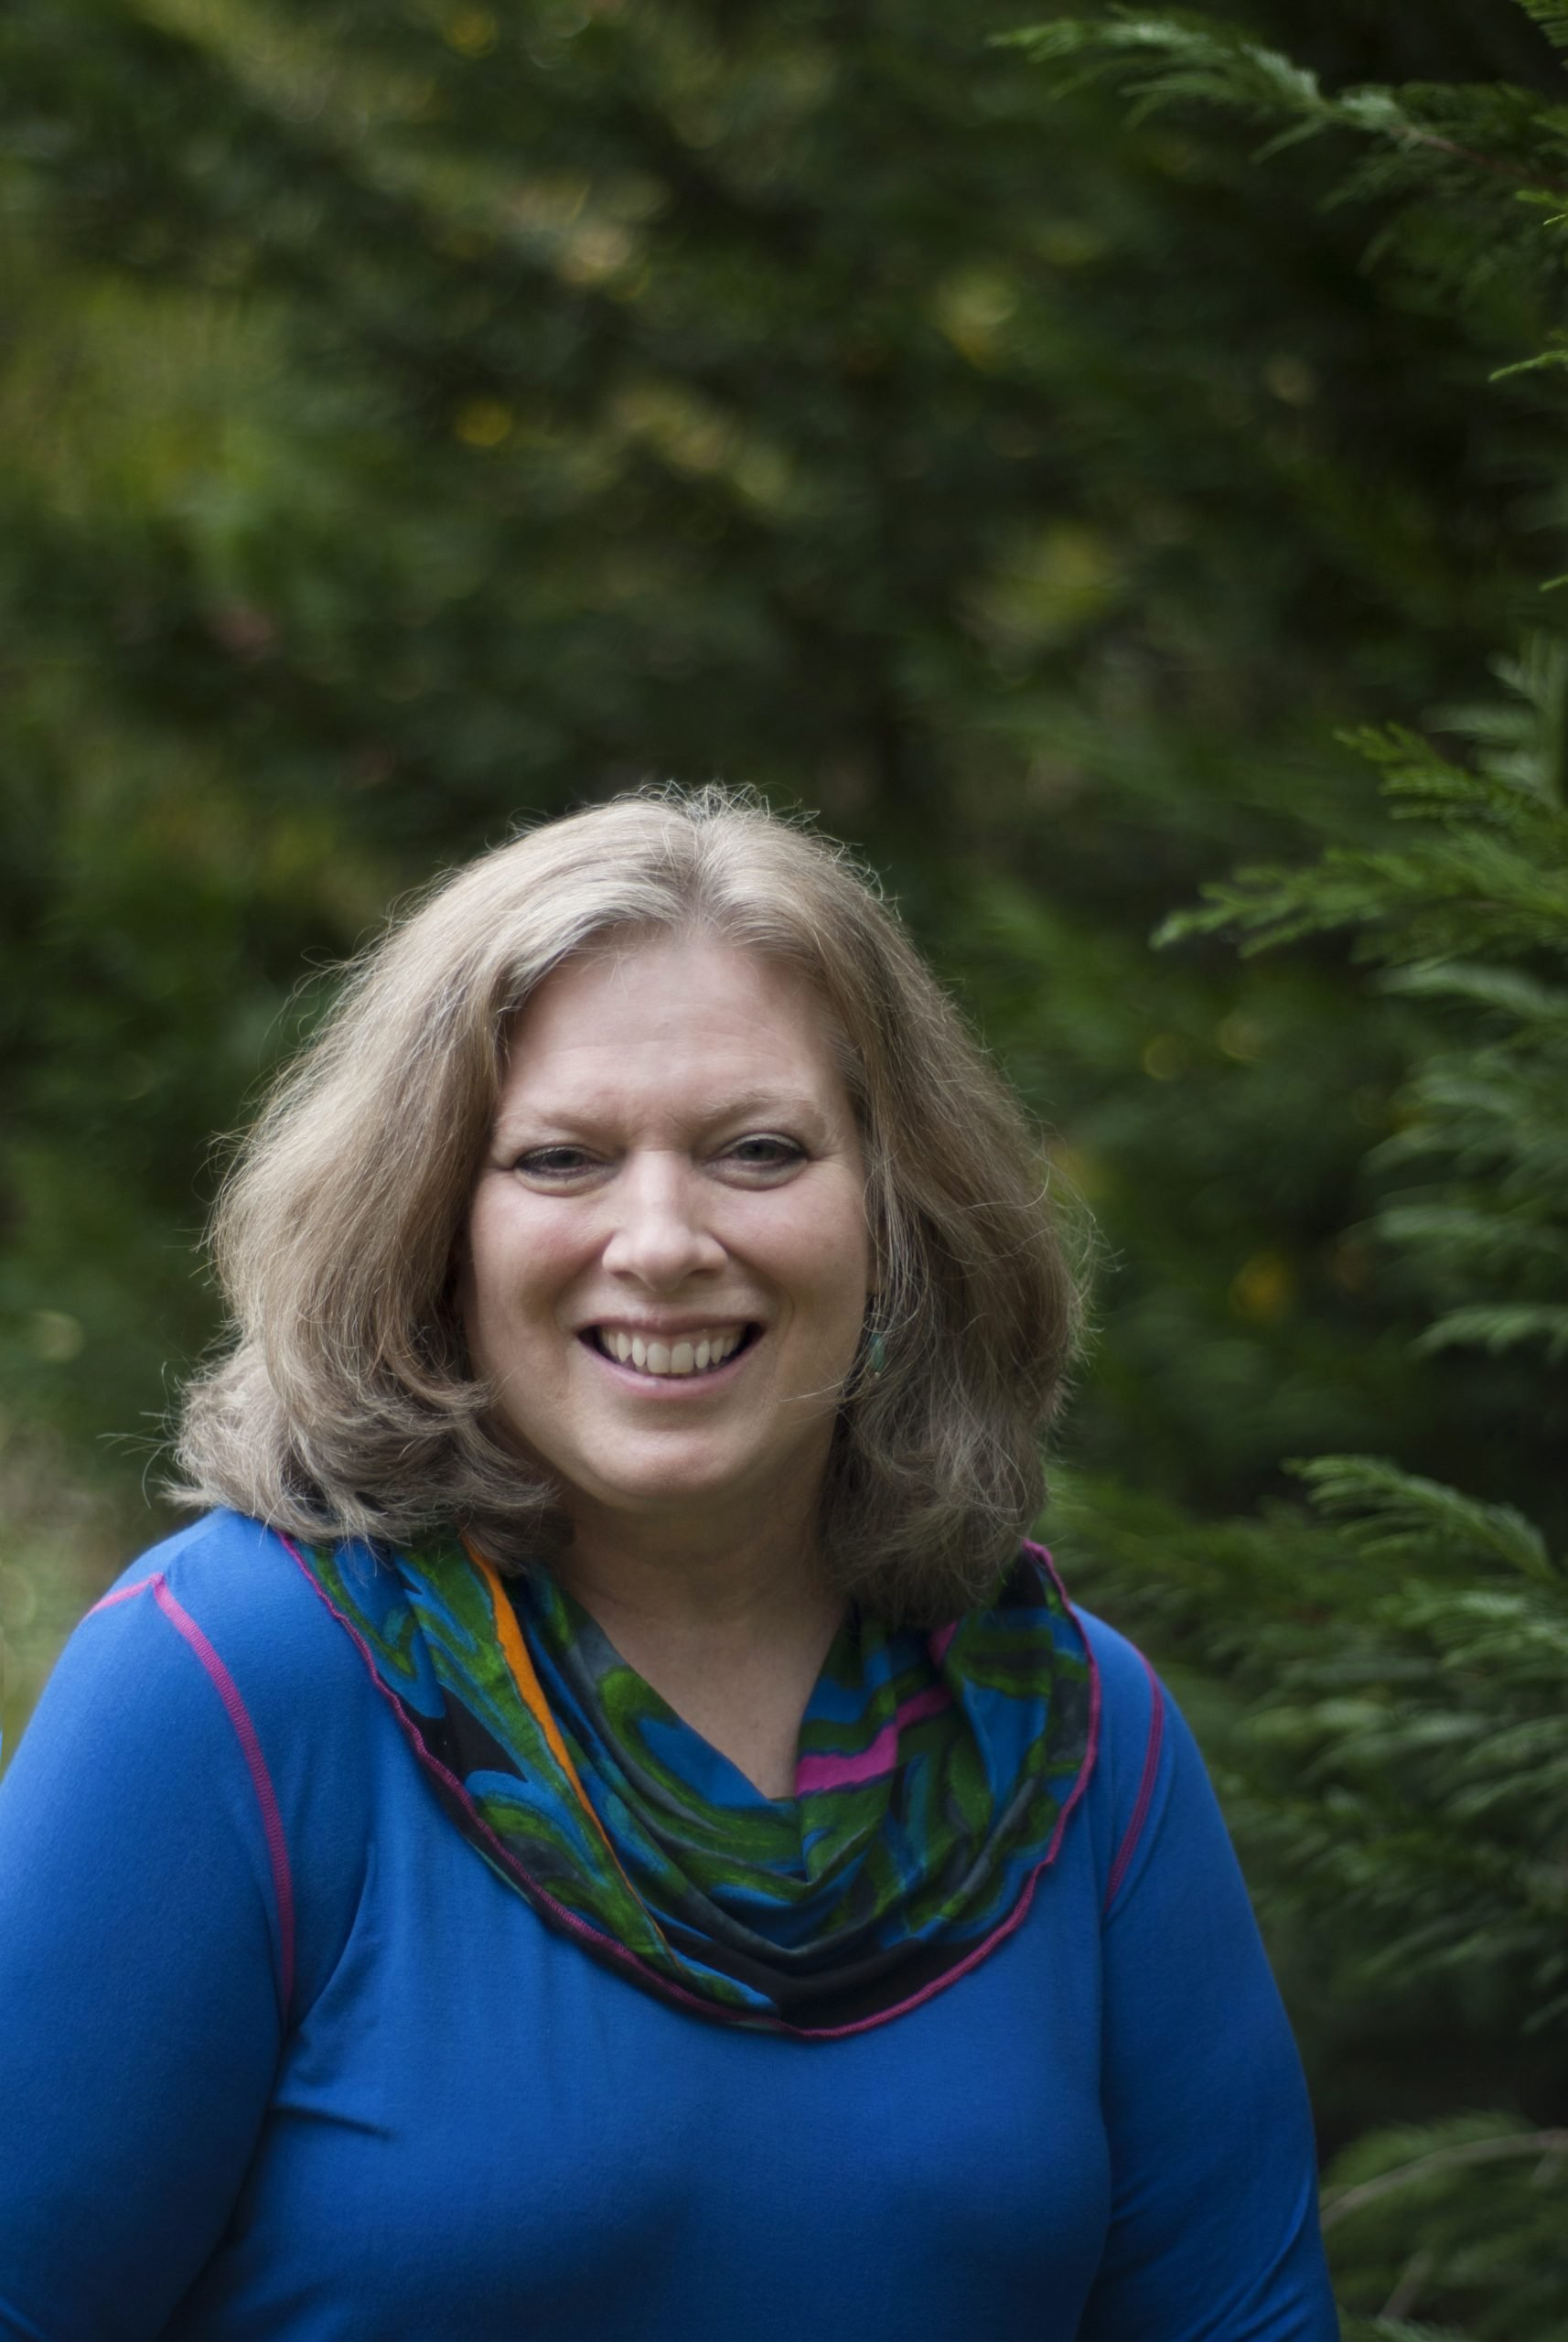 Vicki Tillman, LPCMH, BCC